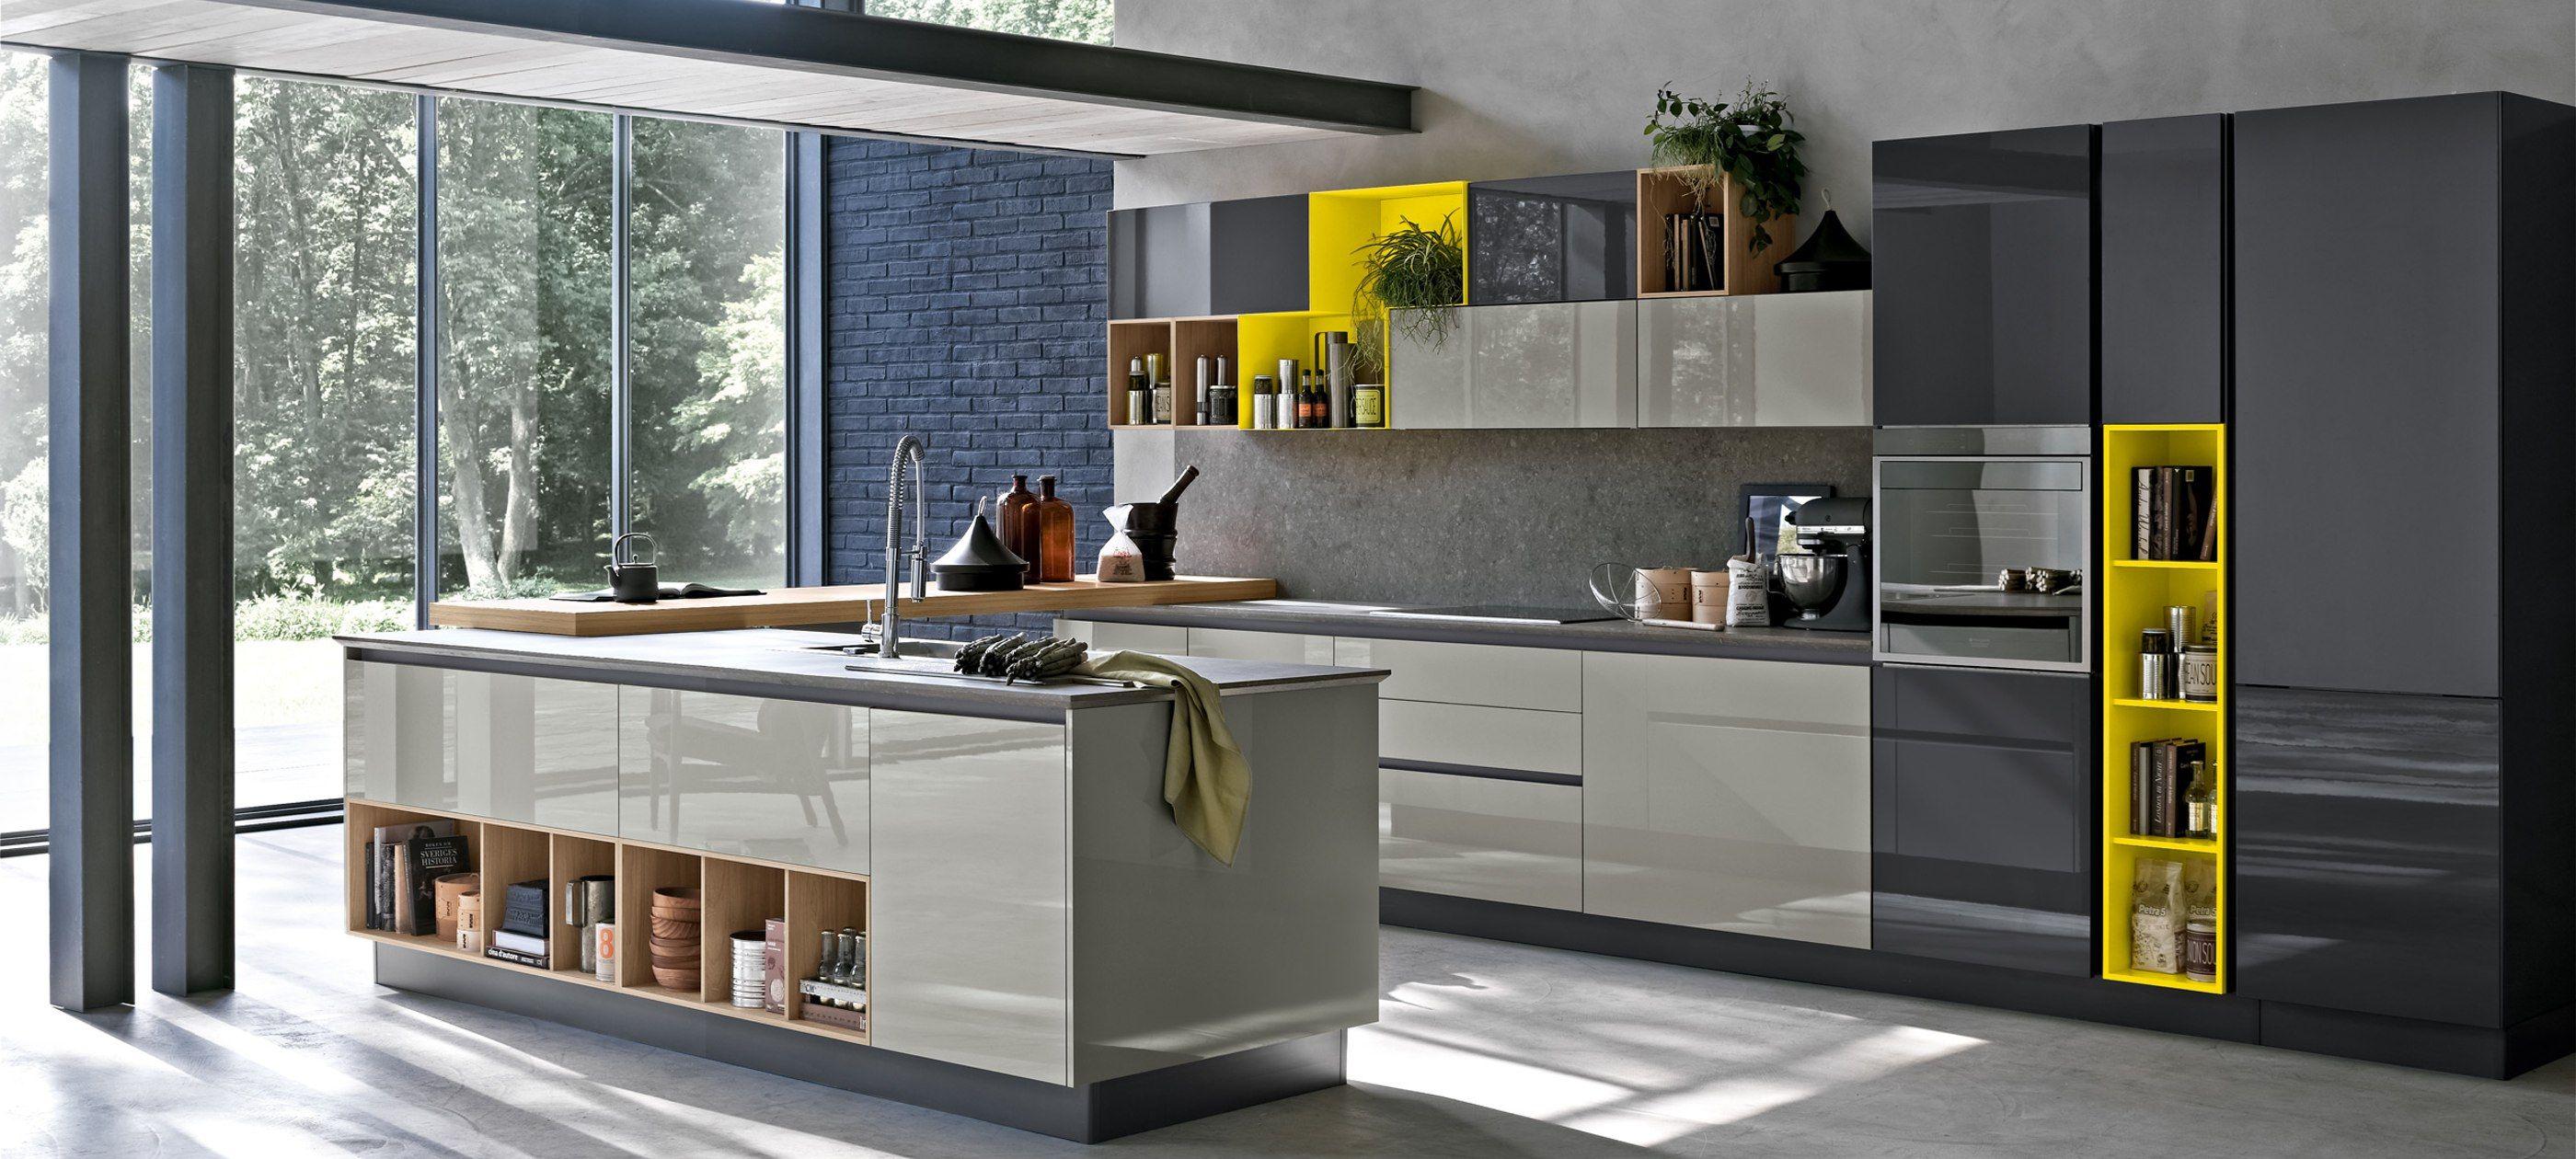 cucine moderne stosa - modello cucina aleve 01 | Interior ...